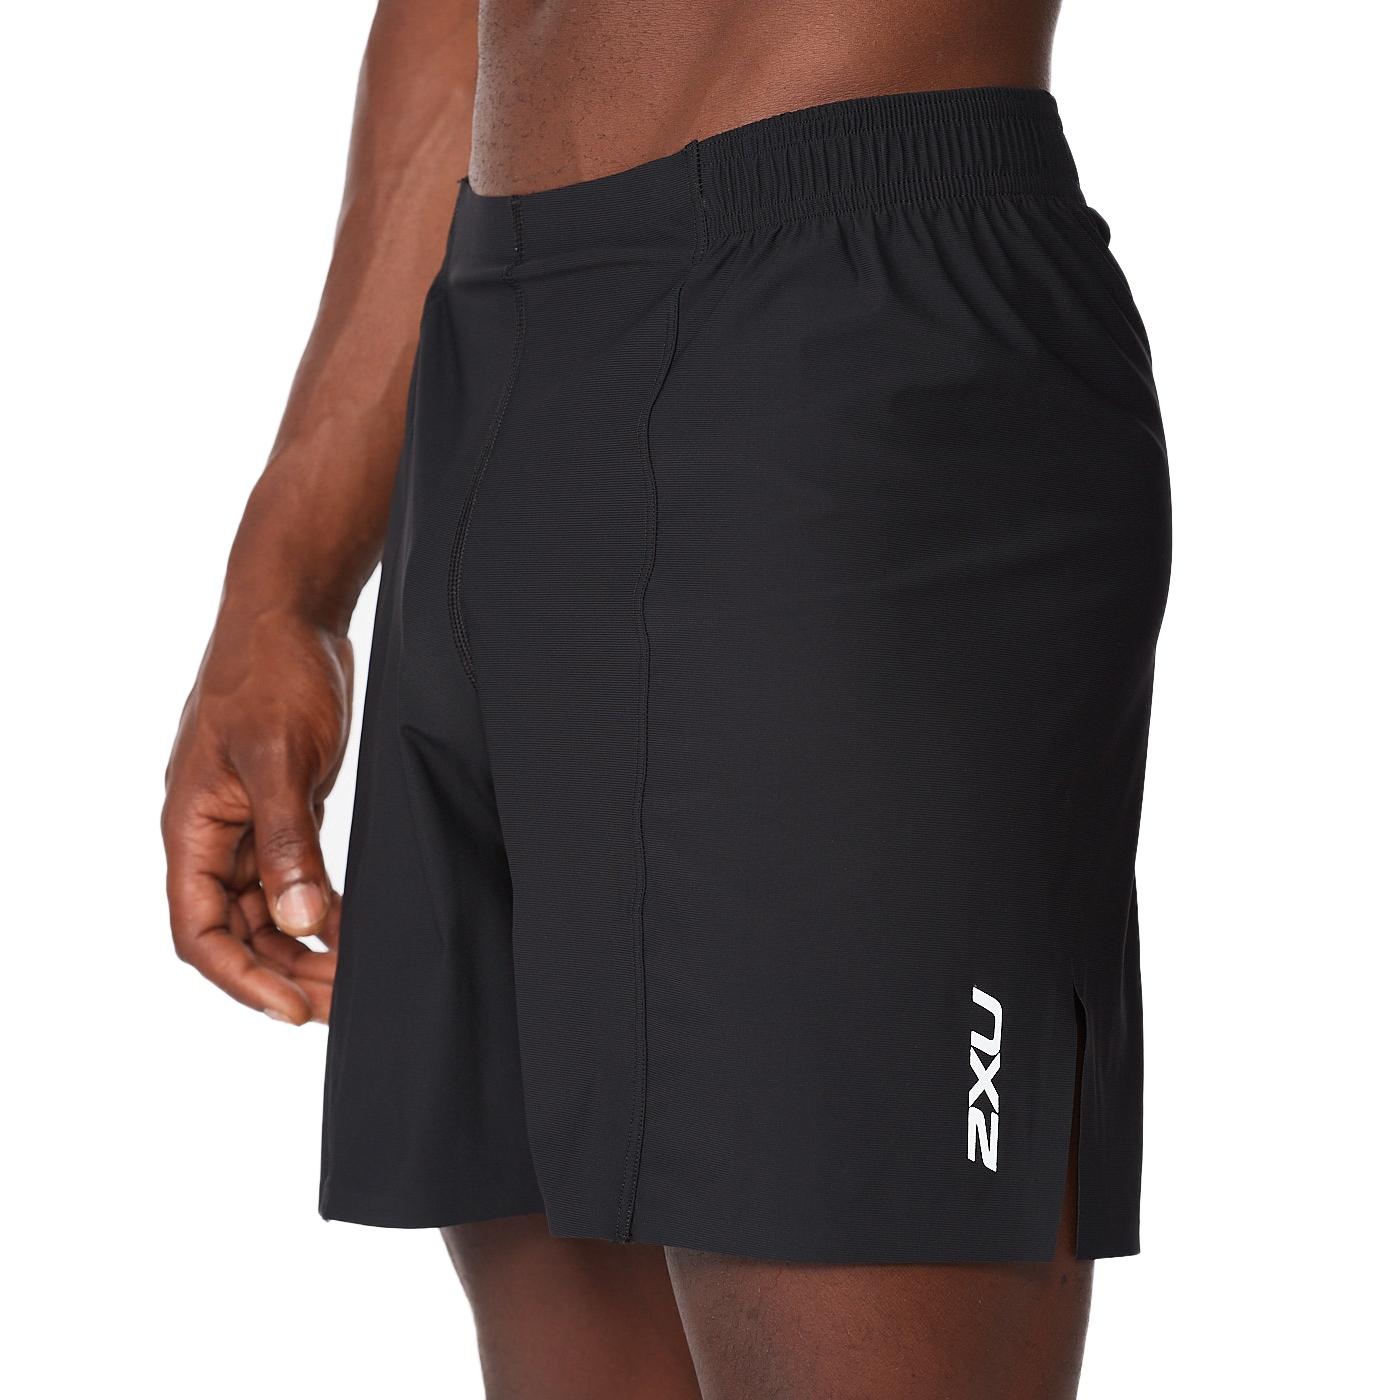 Imagen de 2XU Light Speed 7 Pulgadas Cover Pantalon corto - black/black reflective